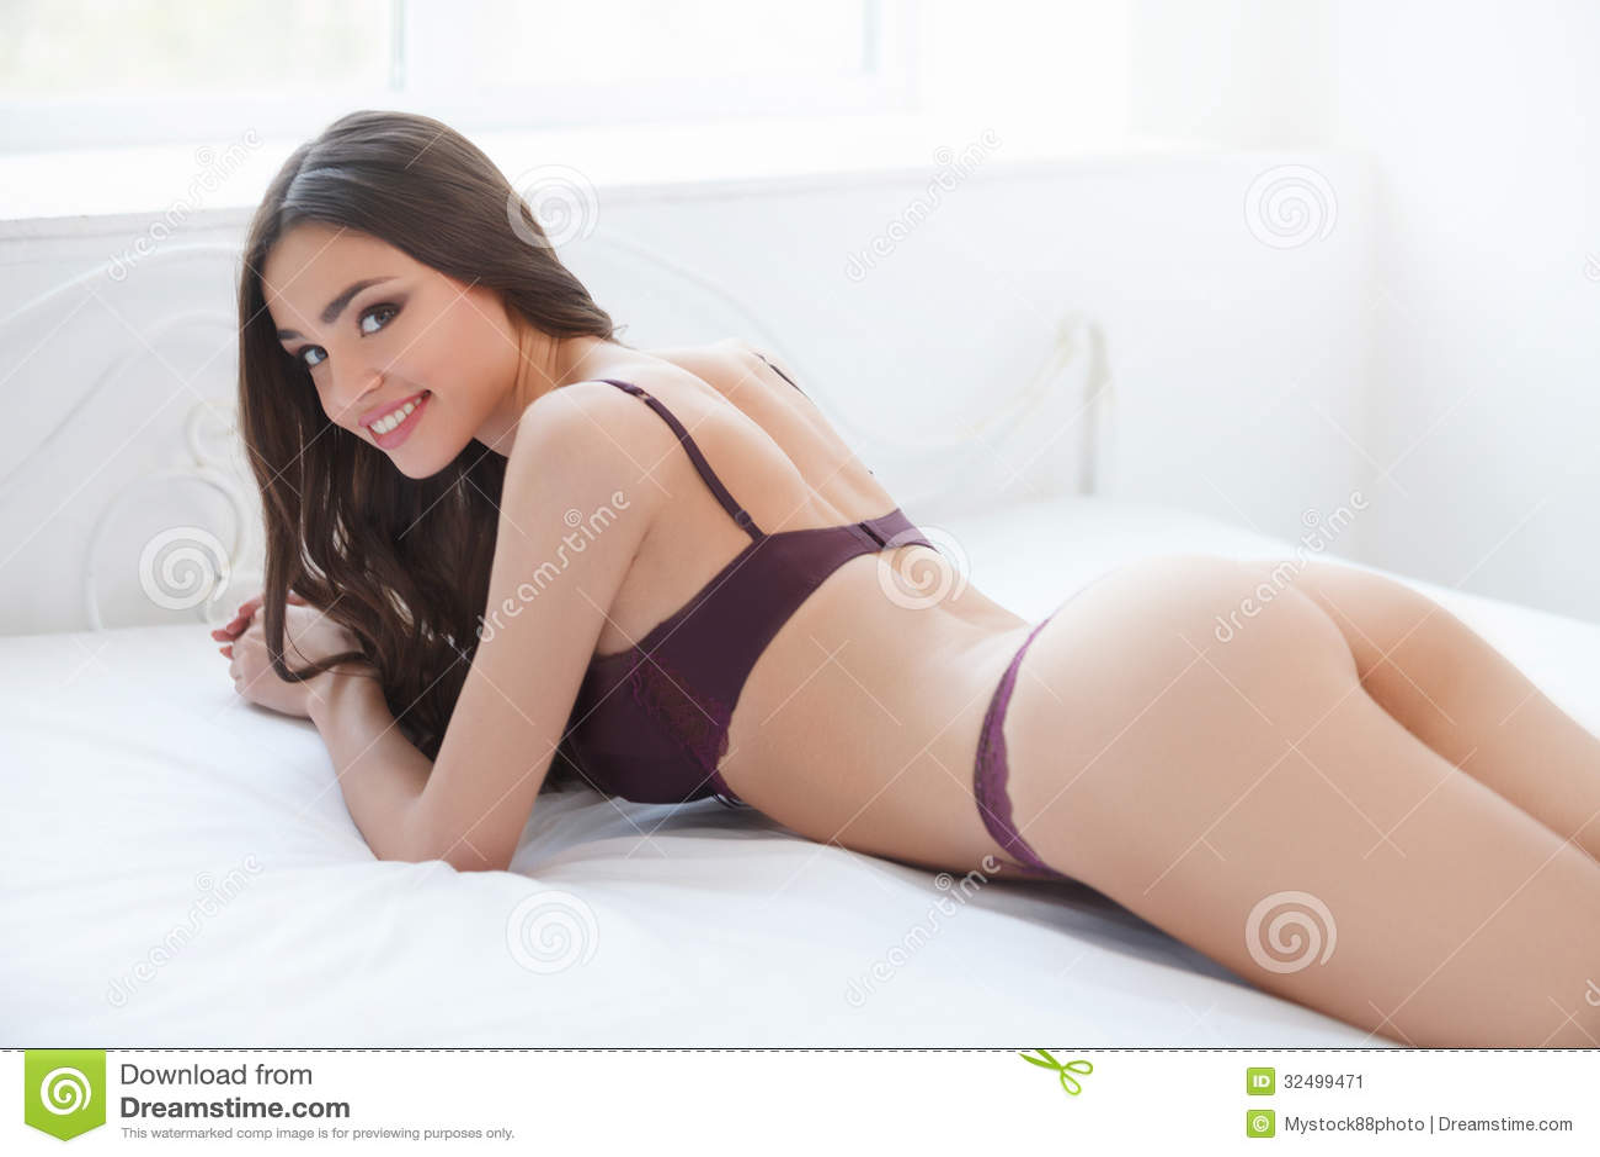 Porno junge damen